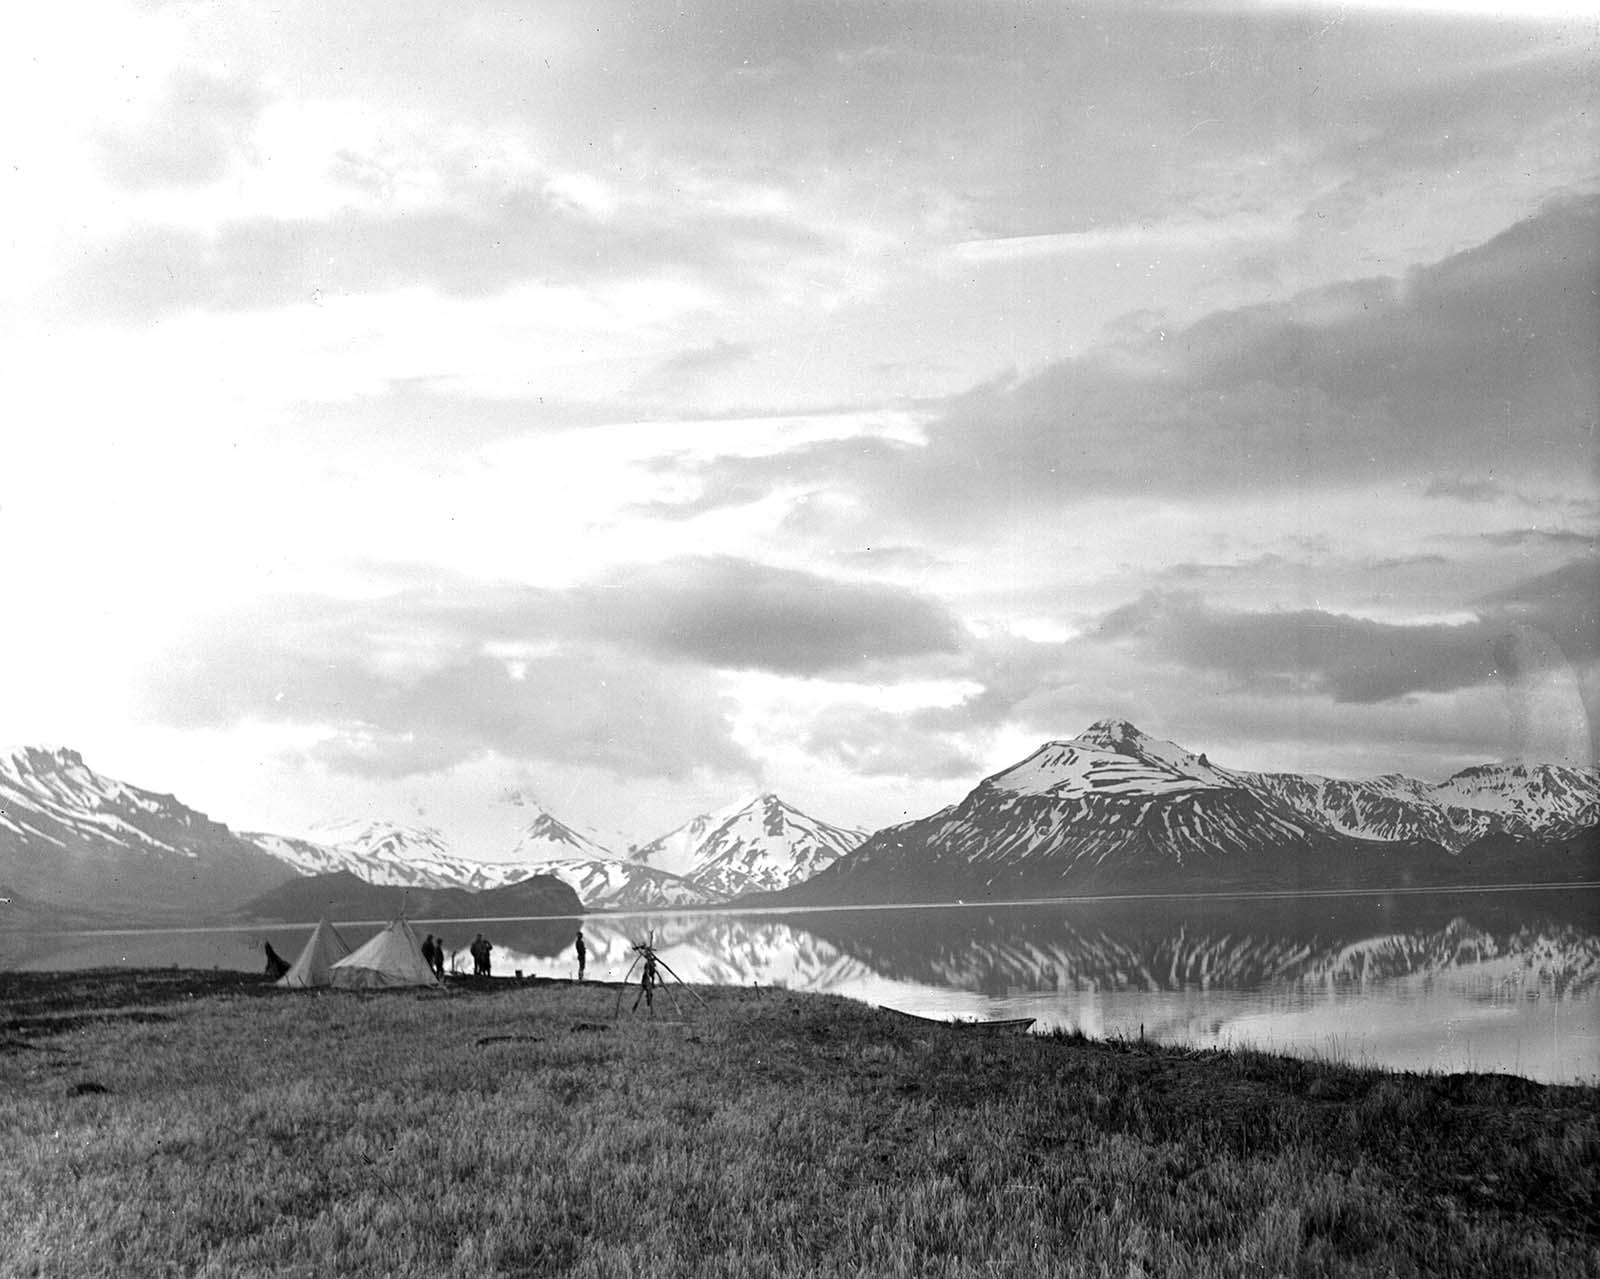 Fig. 15: Bear Lake Camp. MS 305 Harold McCracken Photograph Collection, McCracken Research Library. N115#01990V